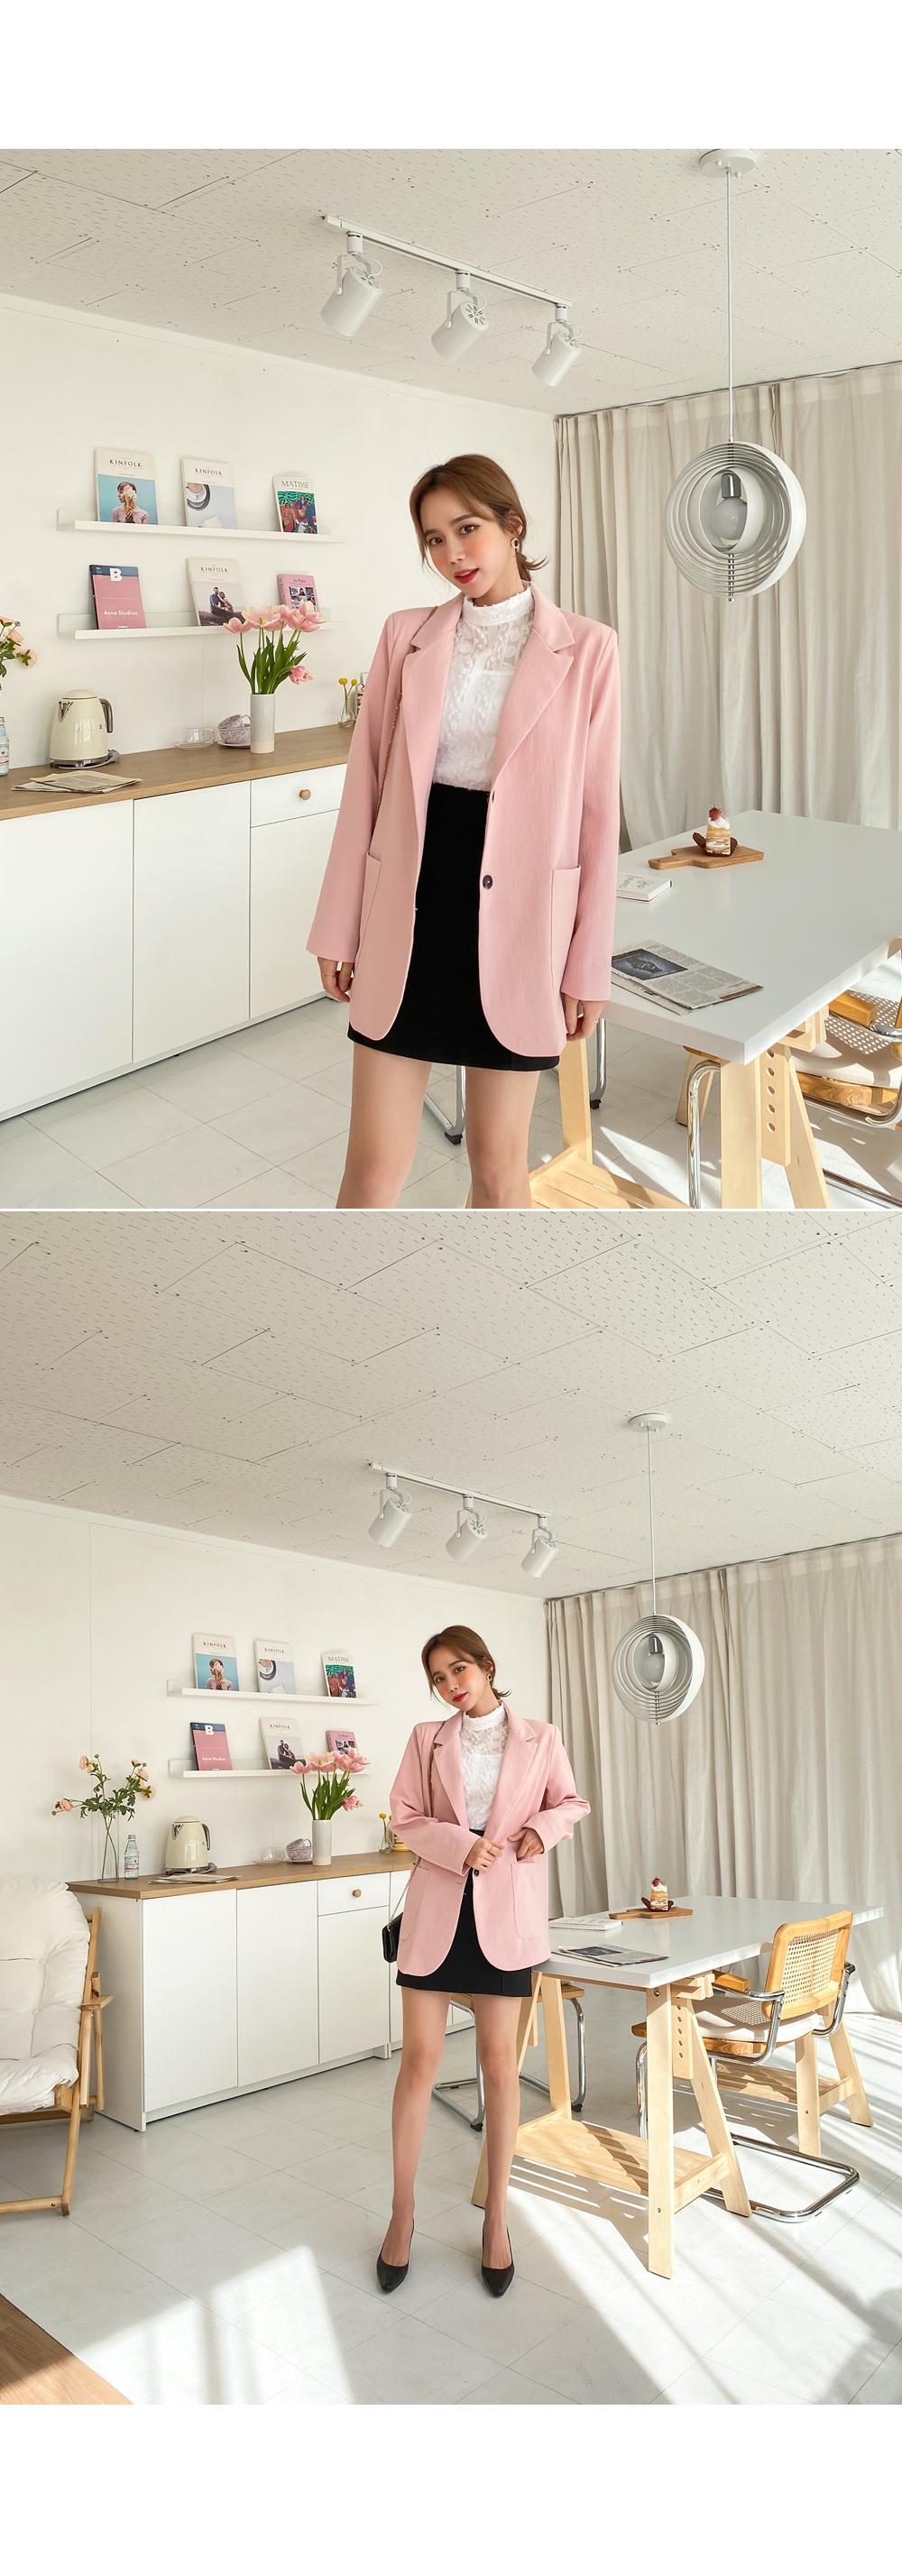 Universal coordinates mini skirt